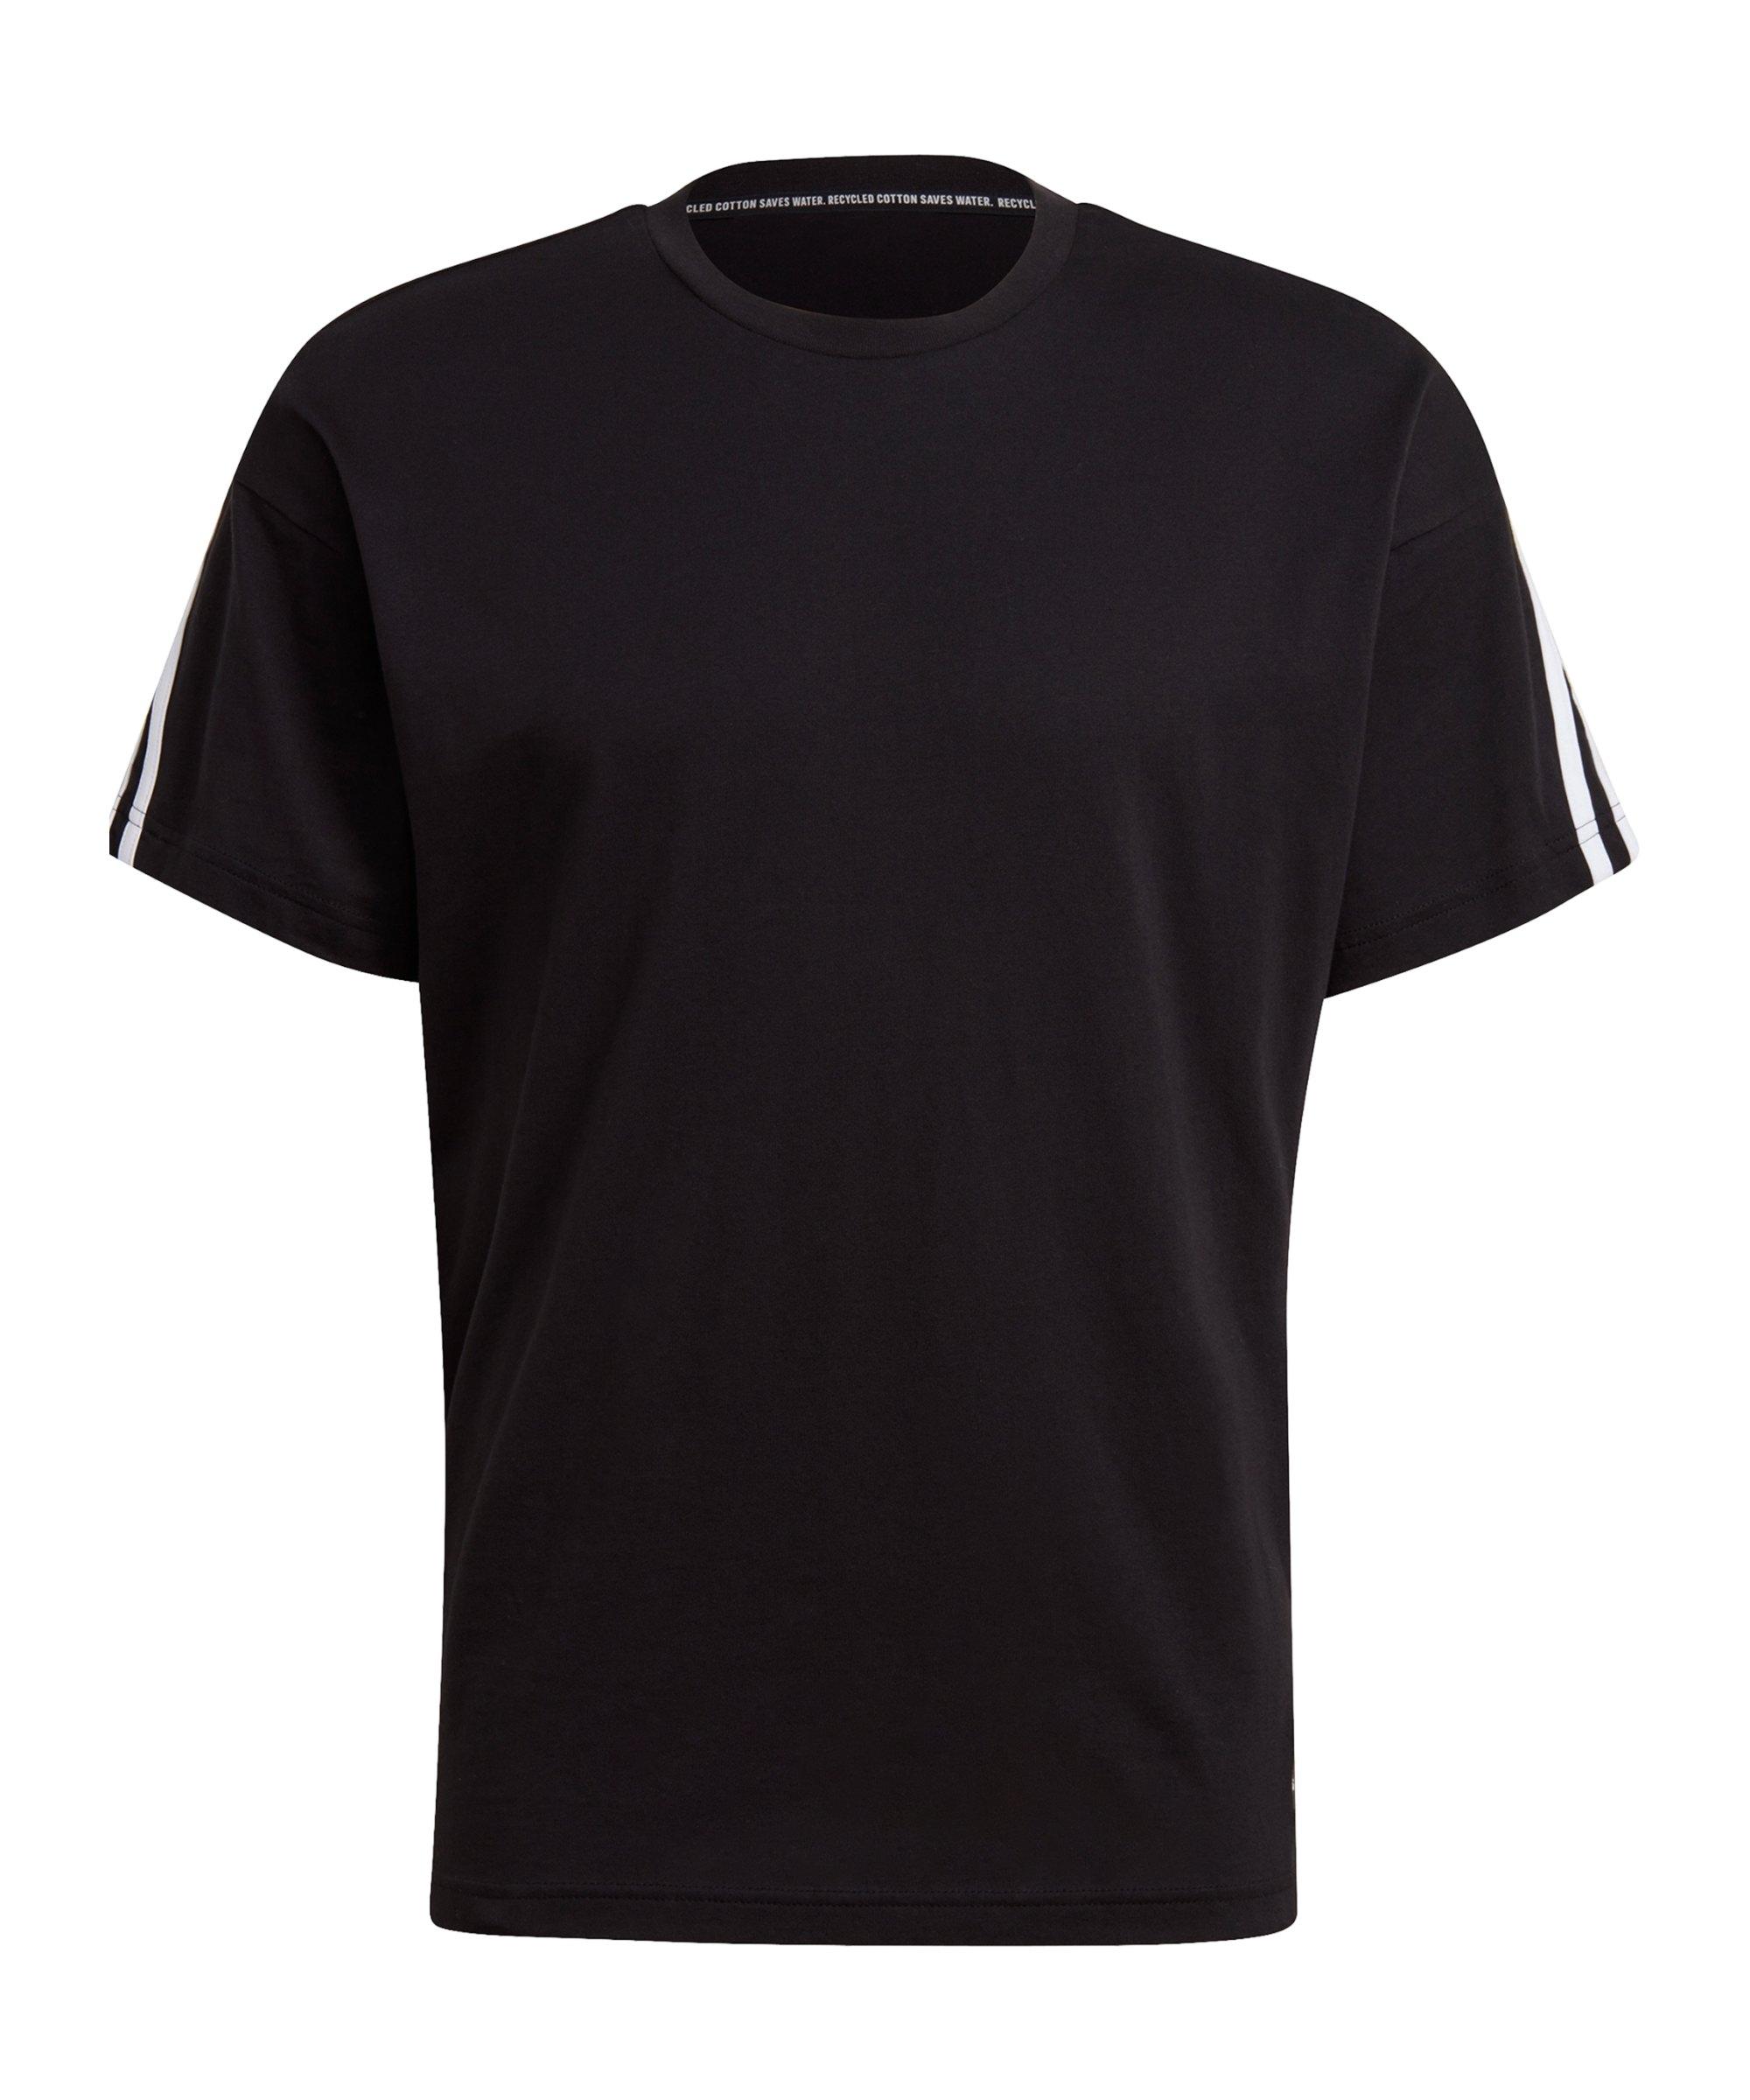 adidas 3 Stripes T-Shirt Schwarz - schwarz